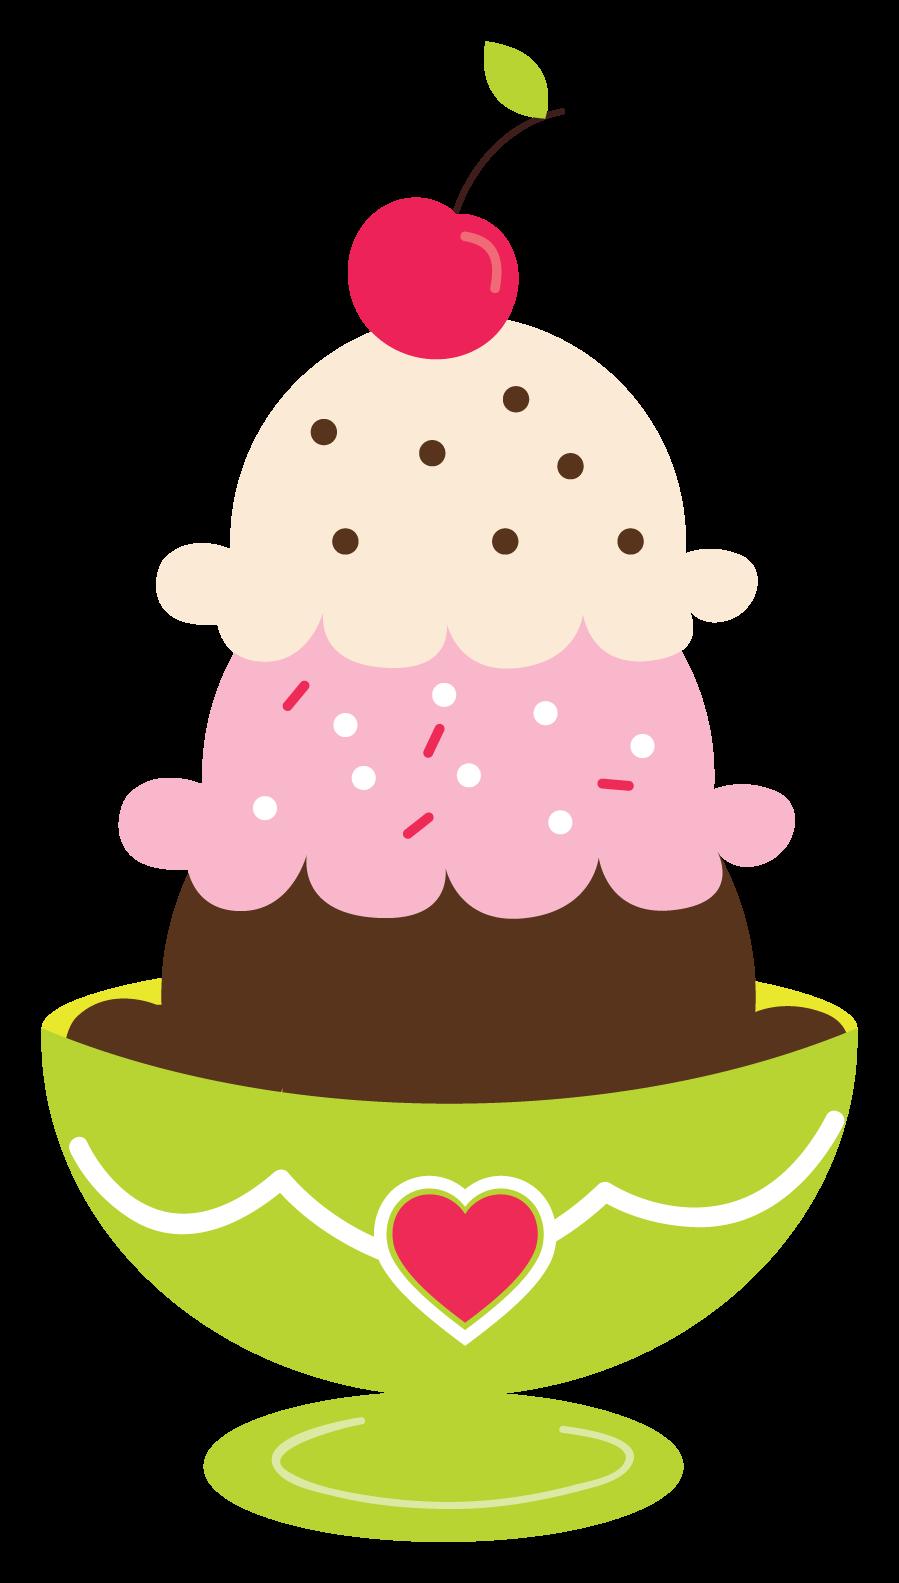 Ice cream sundae clipart kid